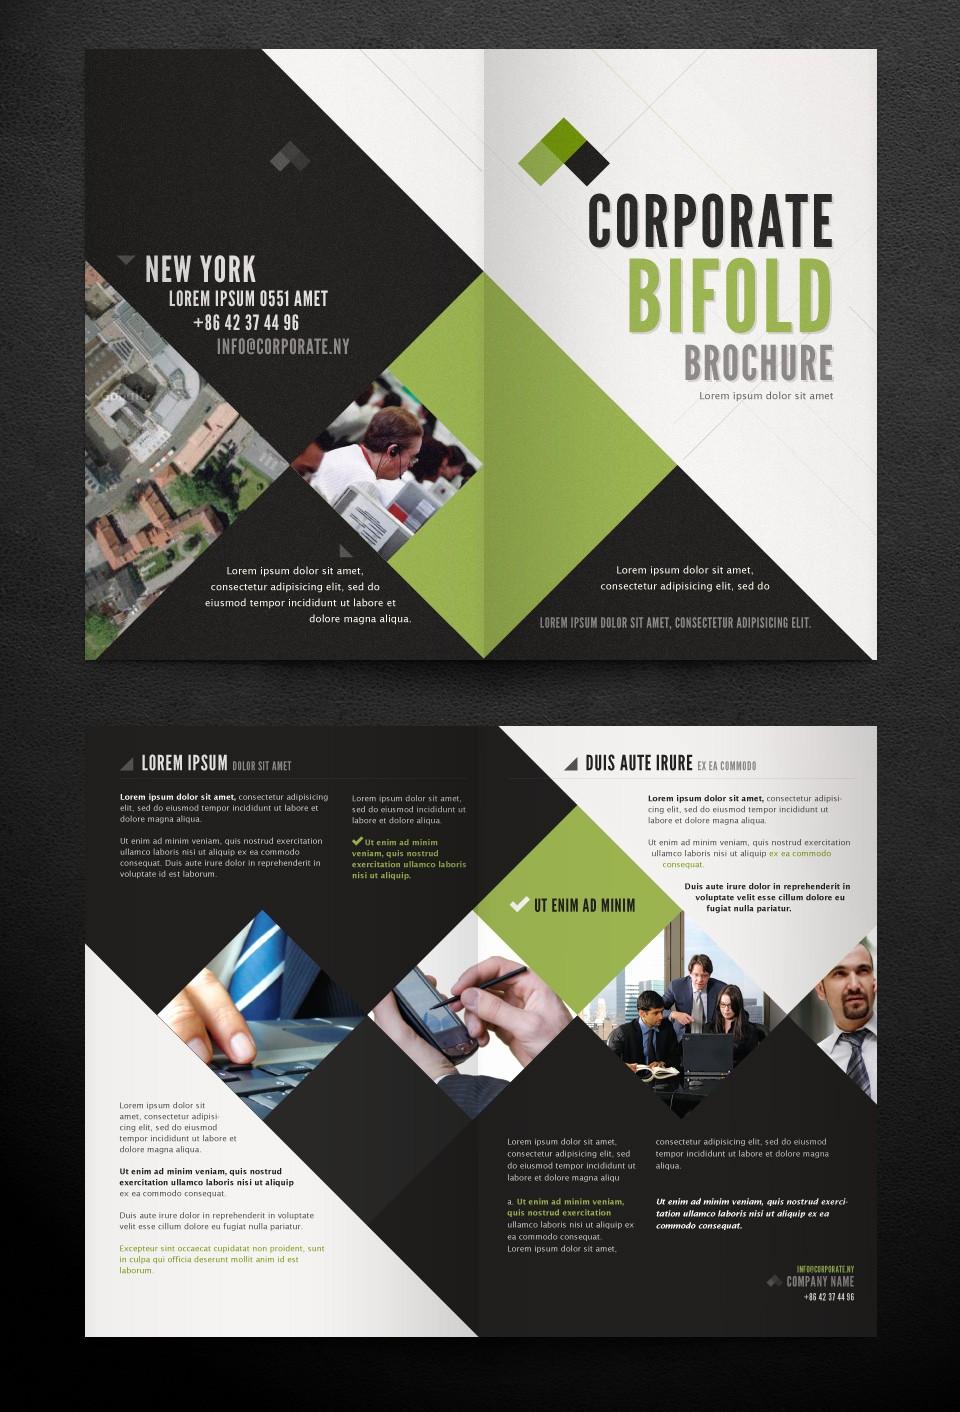 Bi-fold Brochure Template Awesome Corporate Bi Fold Brochure Template